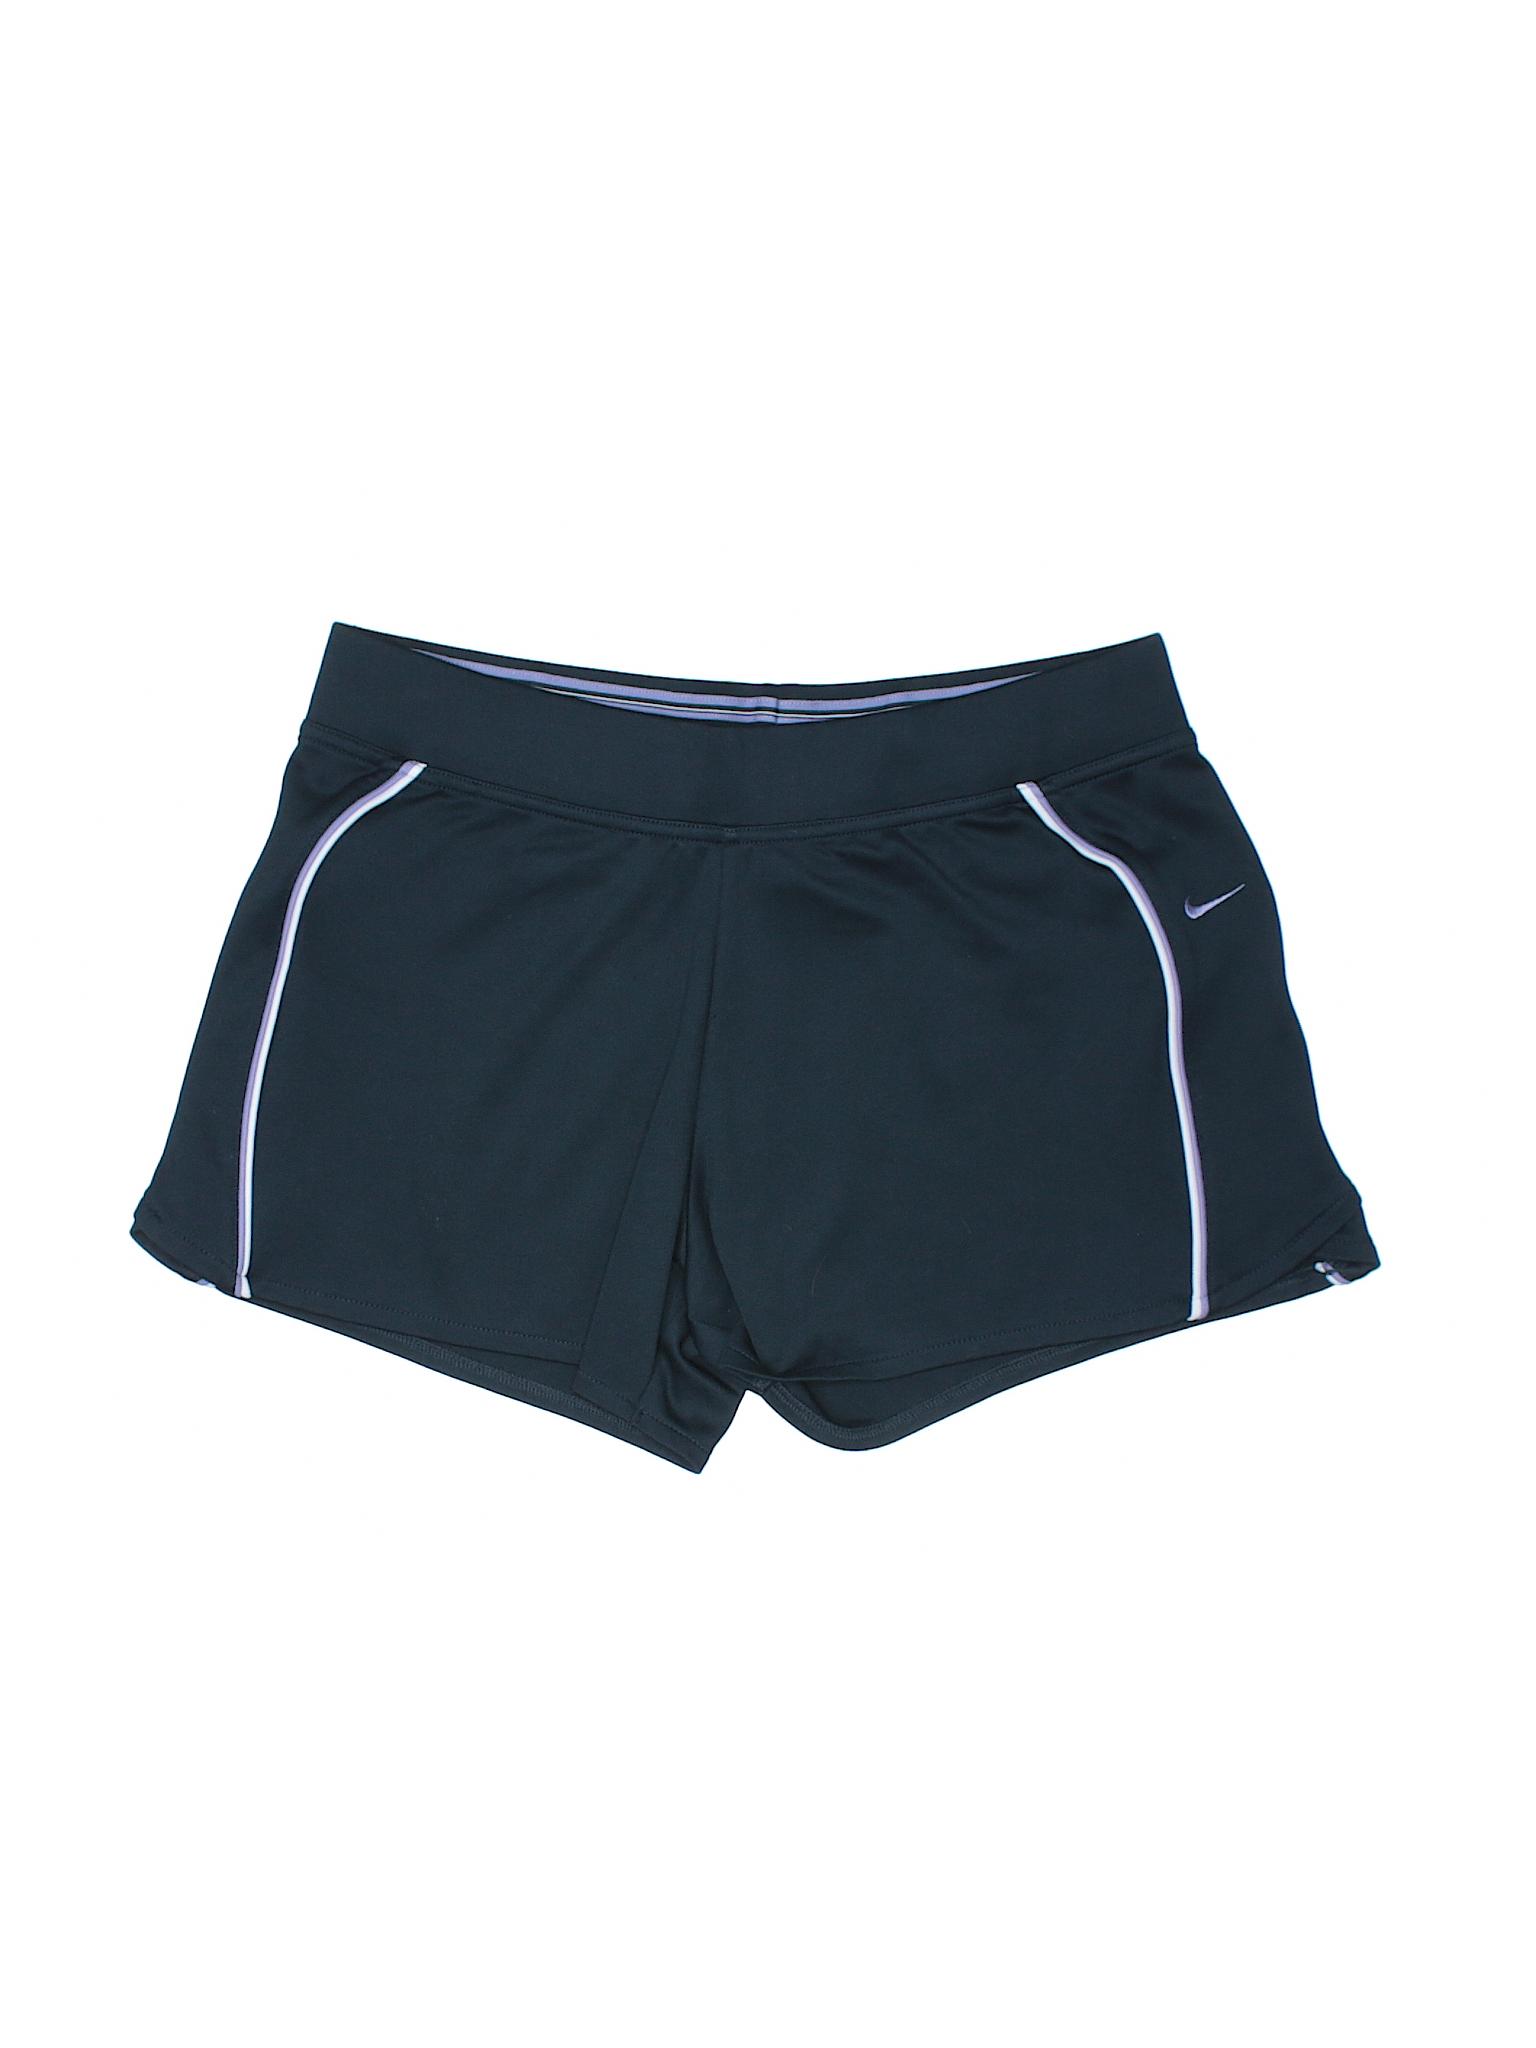 Nike Boutique winter Athletic winter Shorts Nike Boutique BTIZT0zq